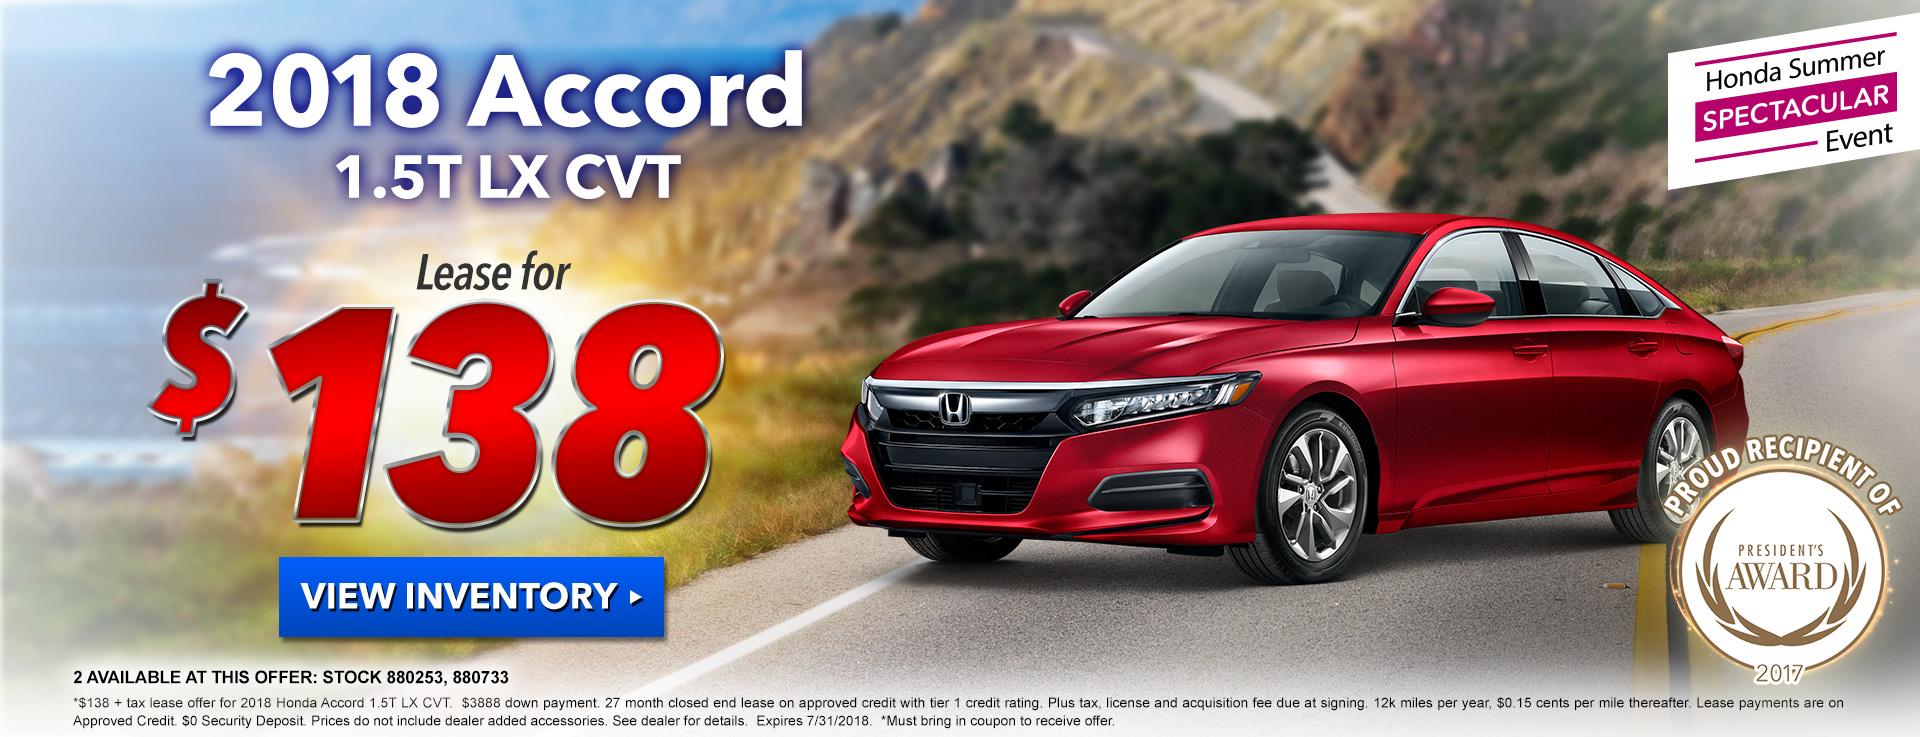 Honda Accord Sedan $138 Lease